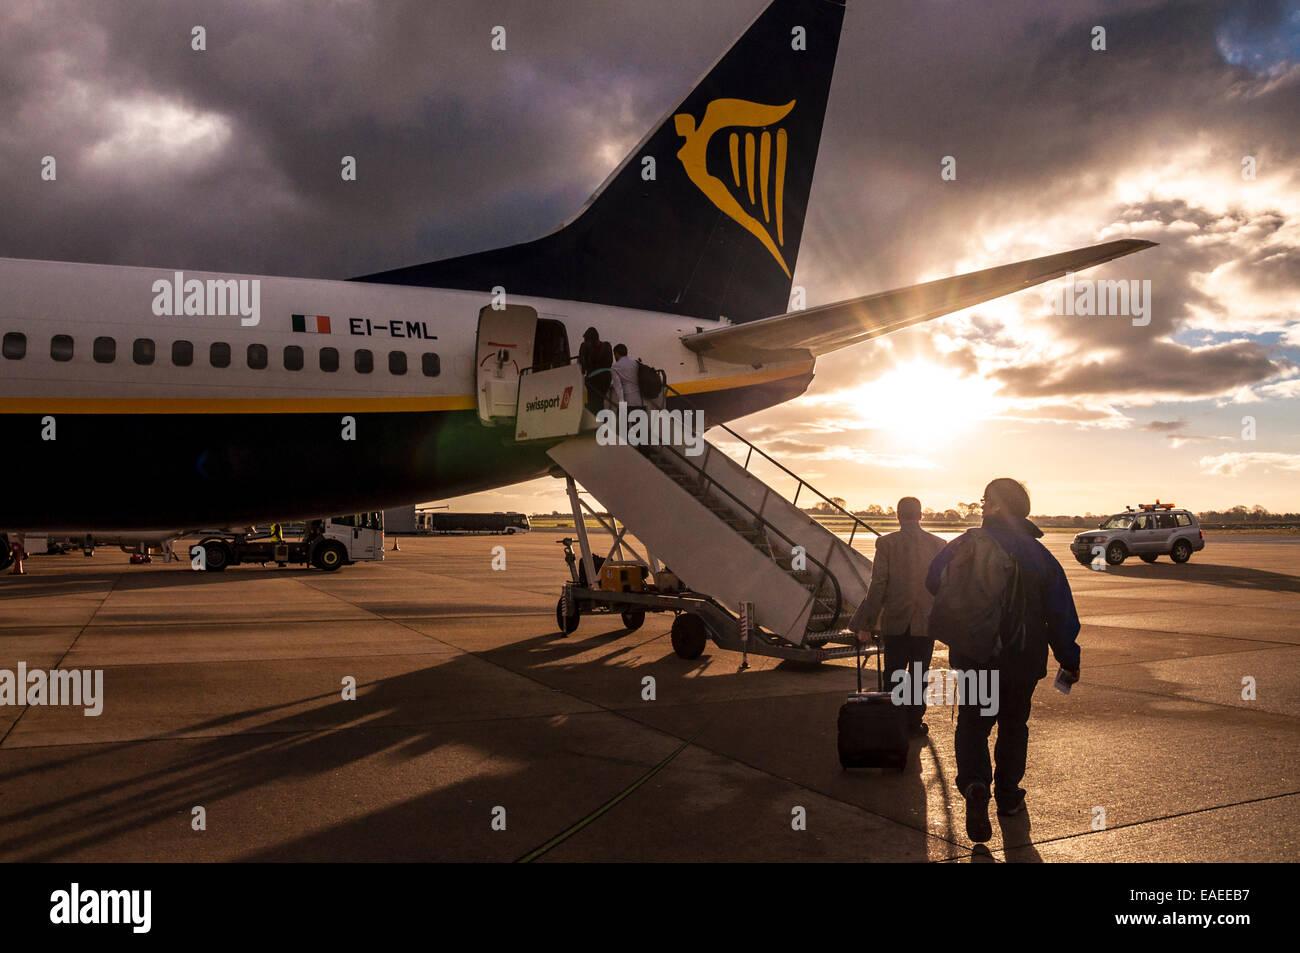 Boarding a Ryanair flight at Bristol Airport UK at sunrise - Stock Image